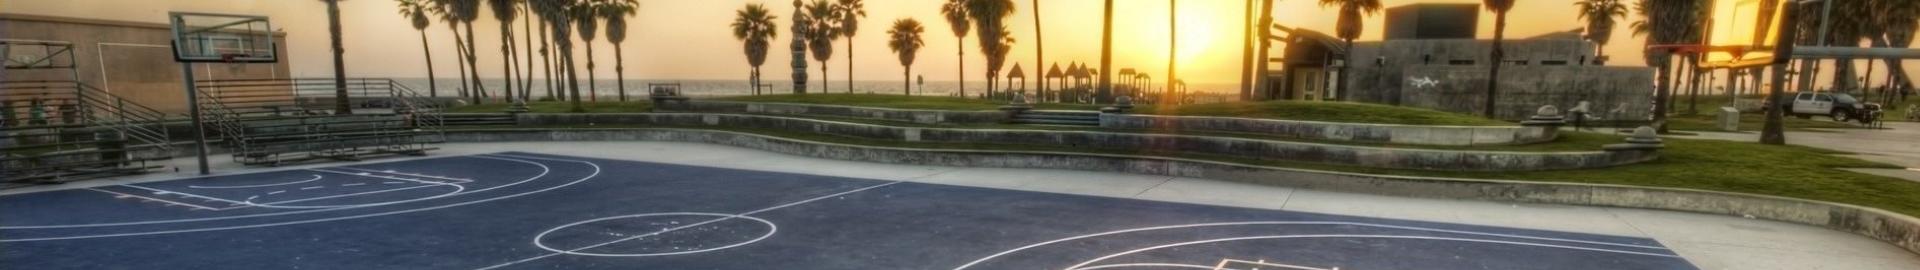 Accessori da Basket Uomo/Donna/Bambino | Basket Zone Siena